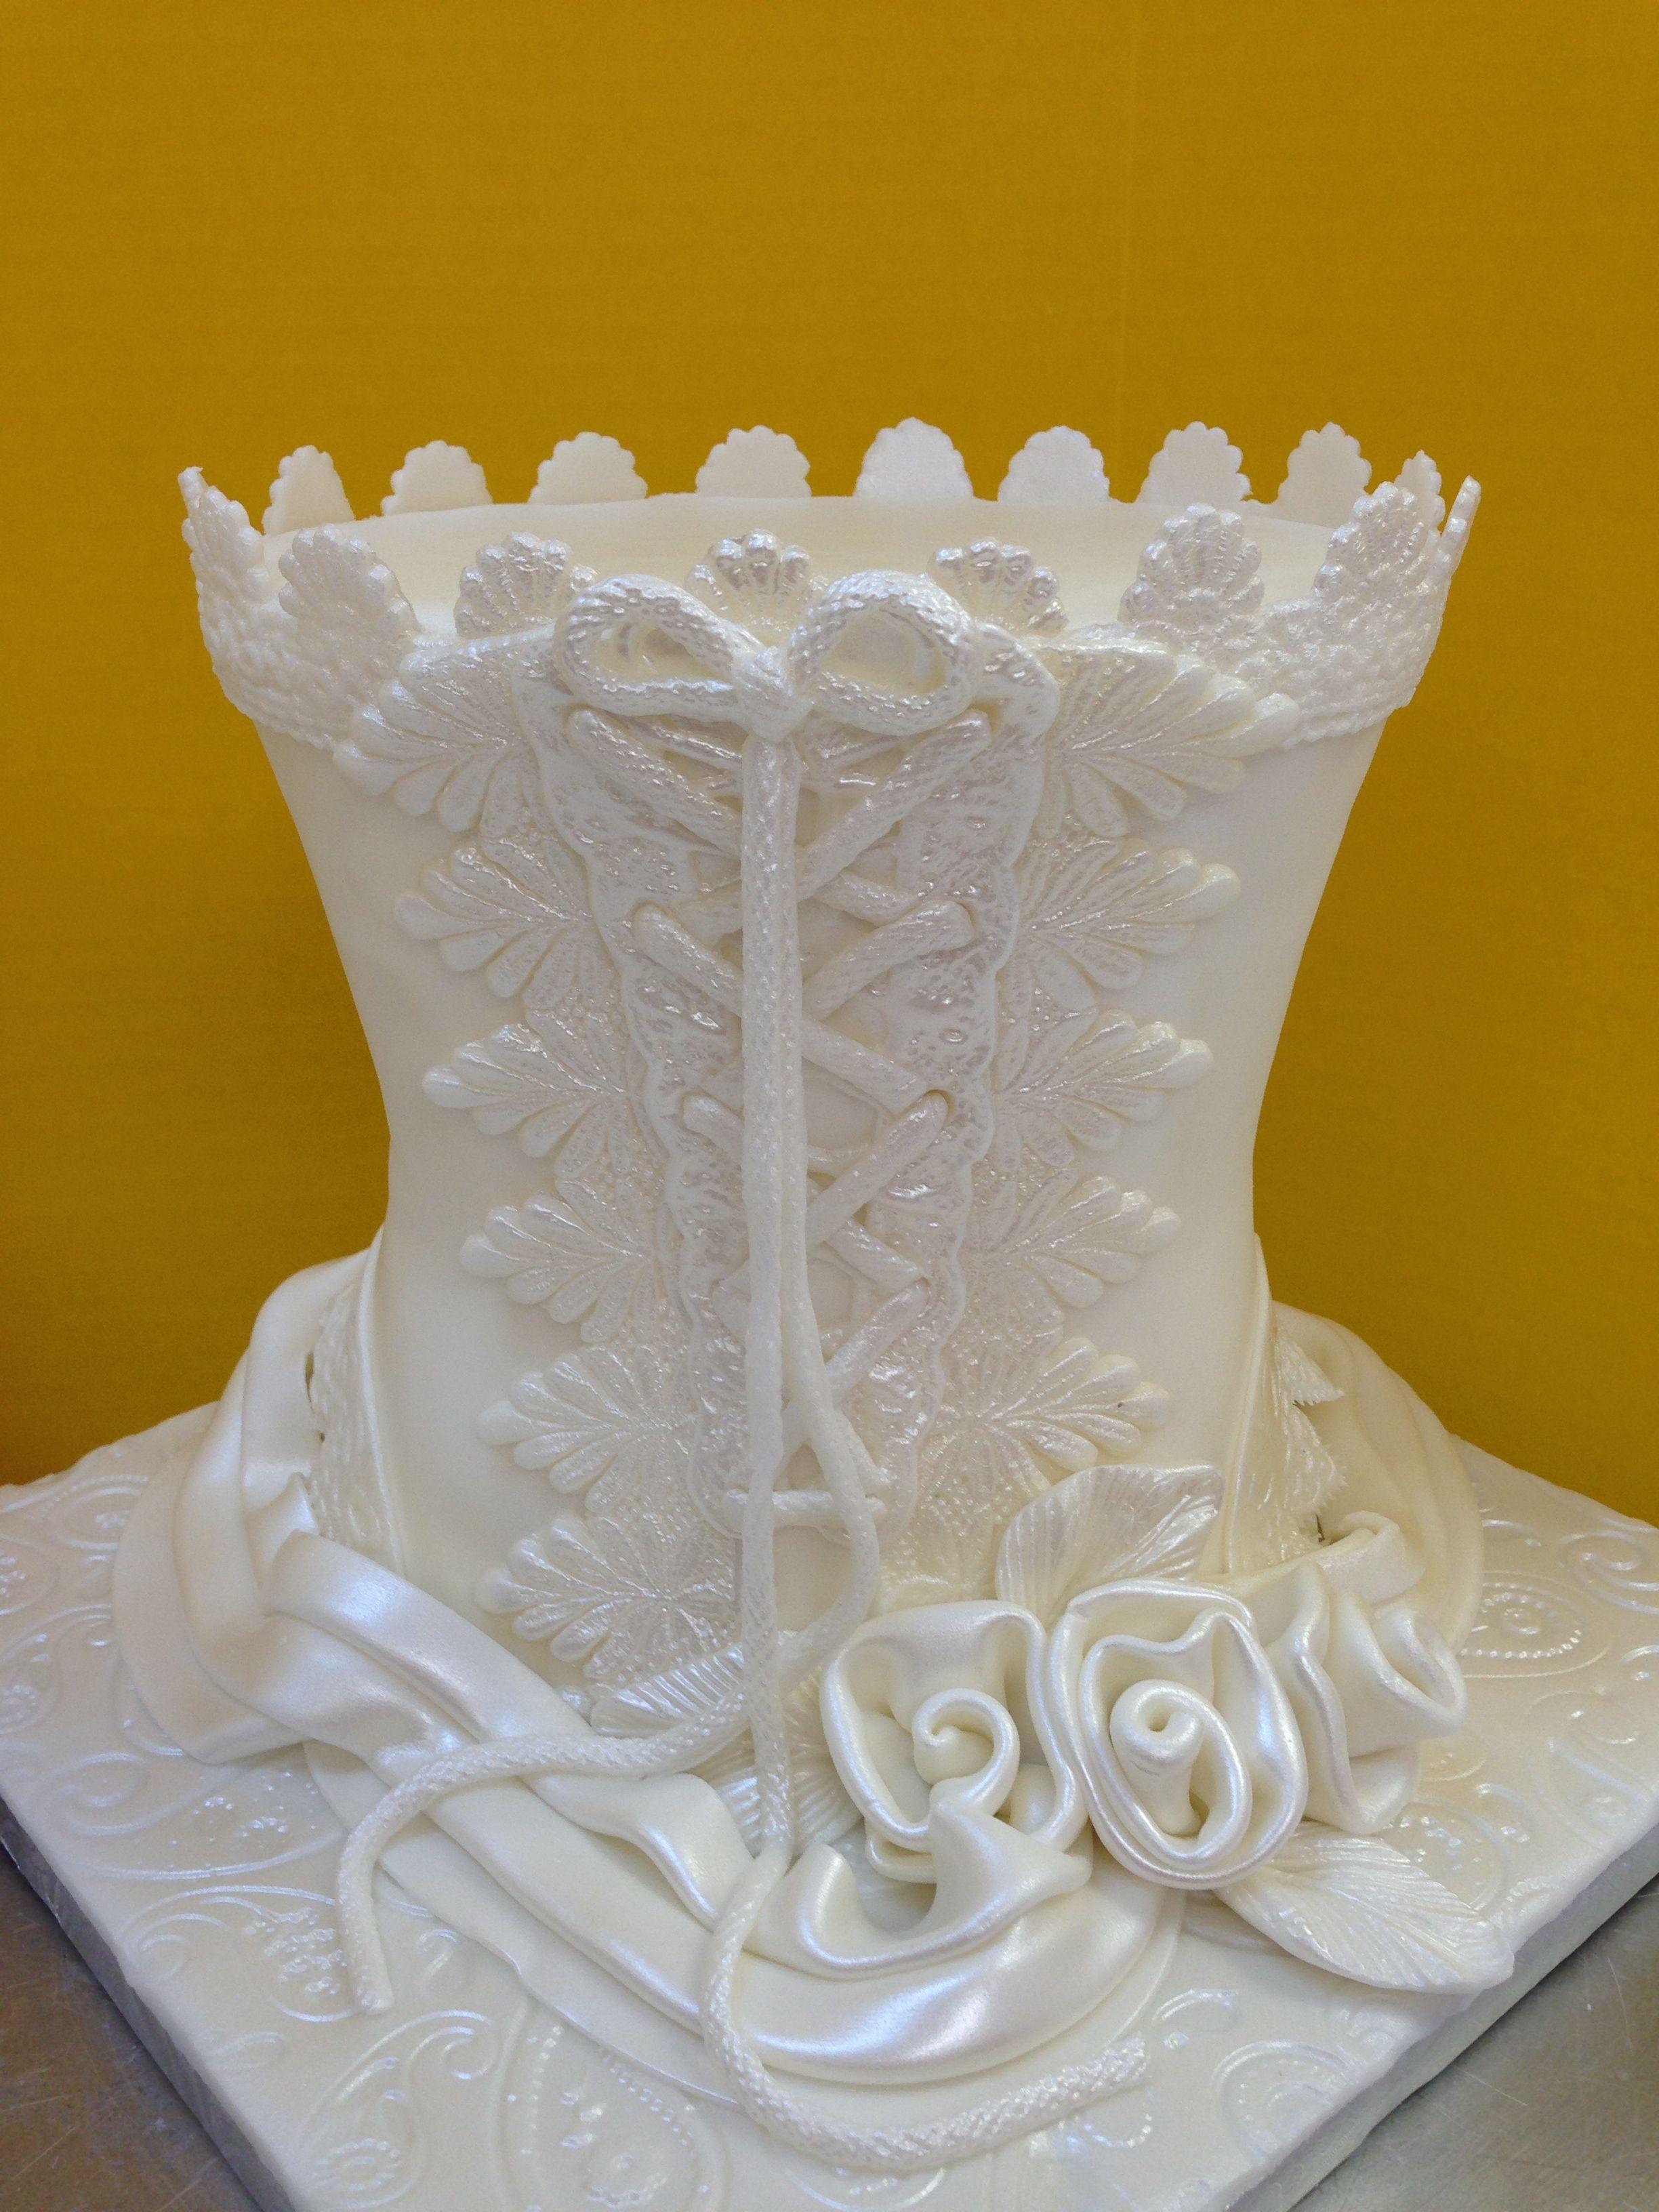 White Corset. CakeSuppliesDepot.com